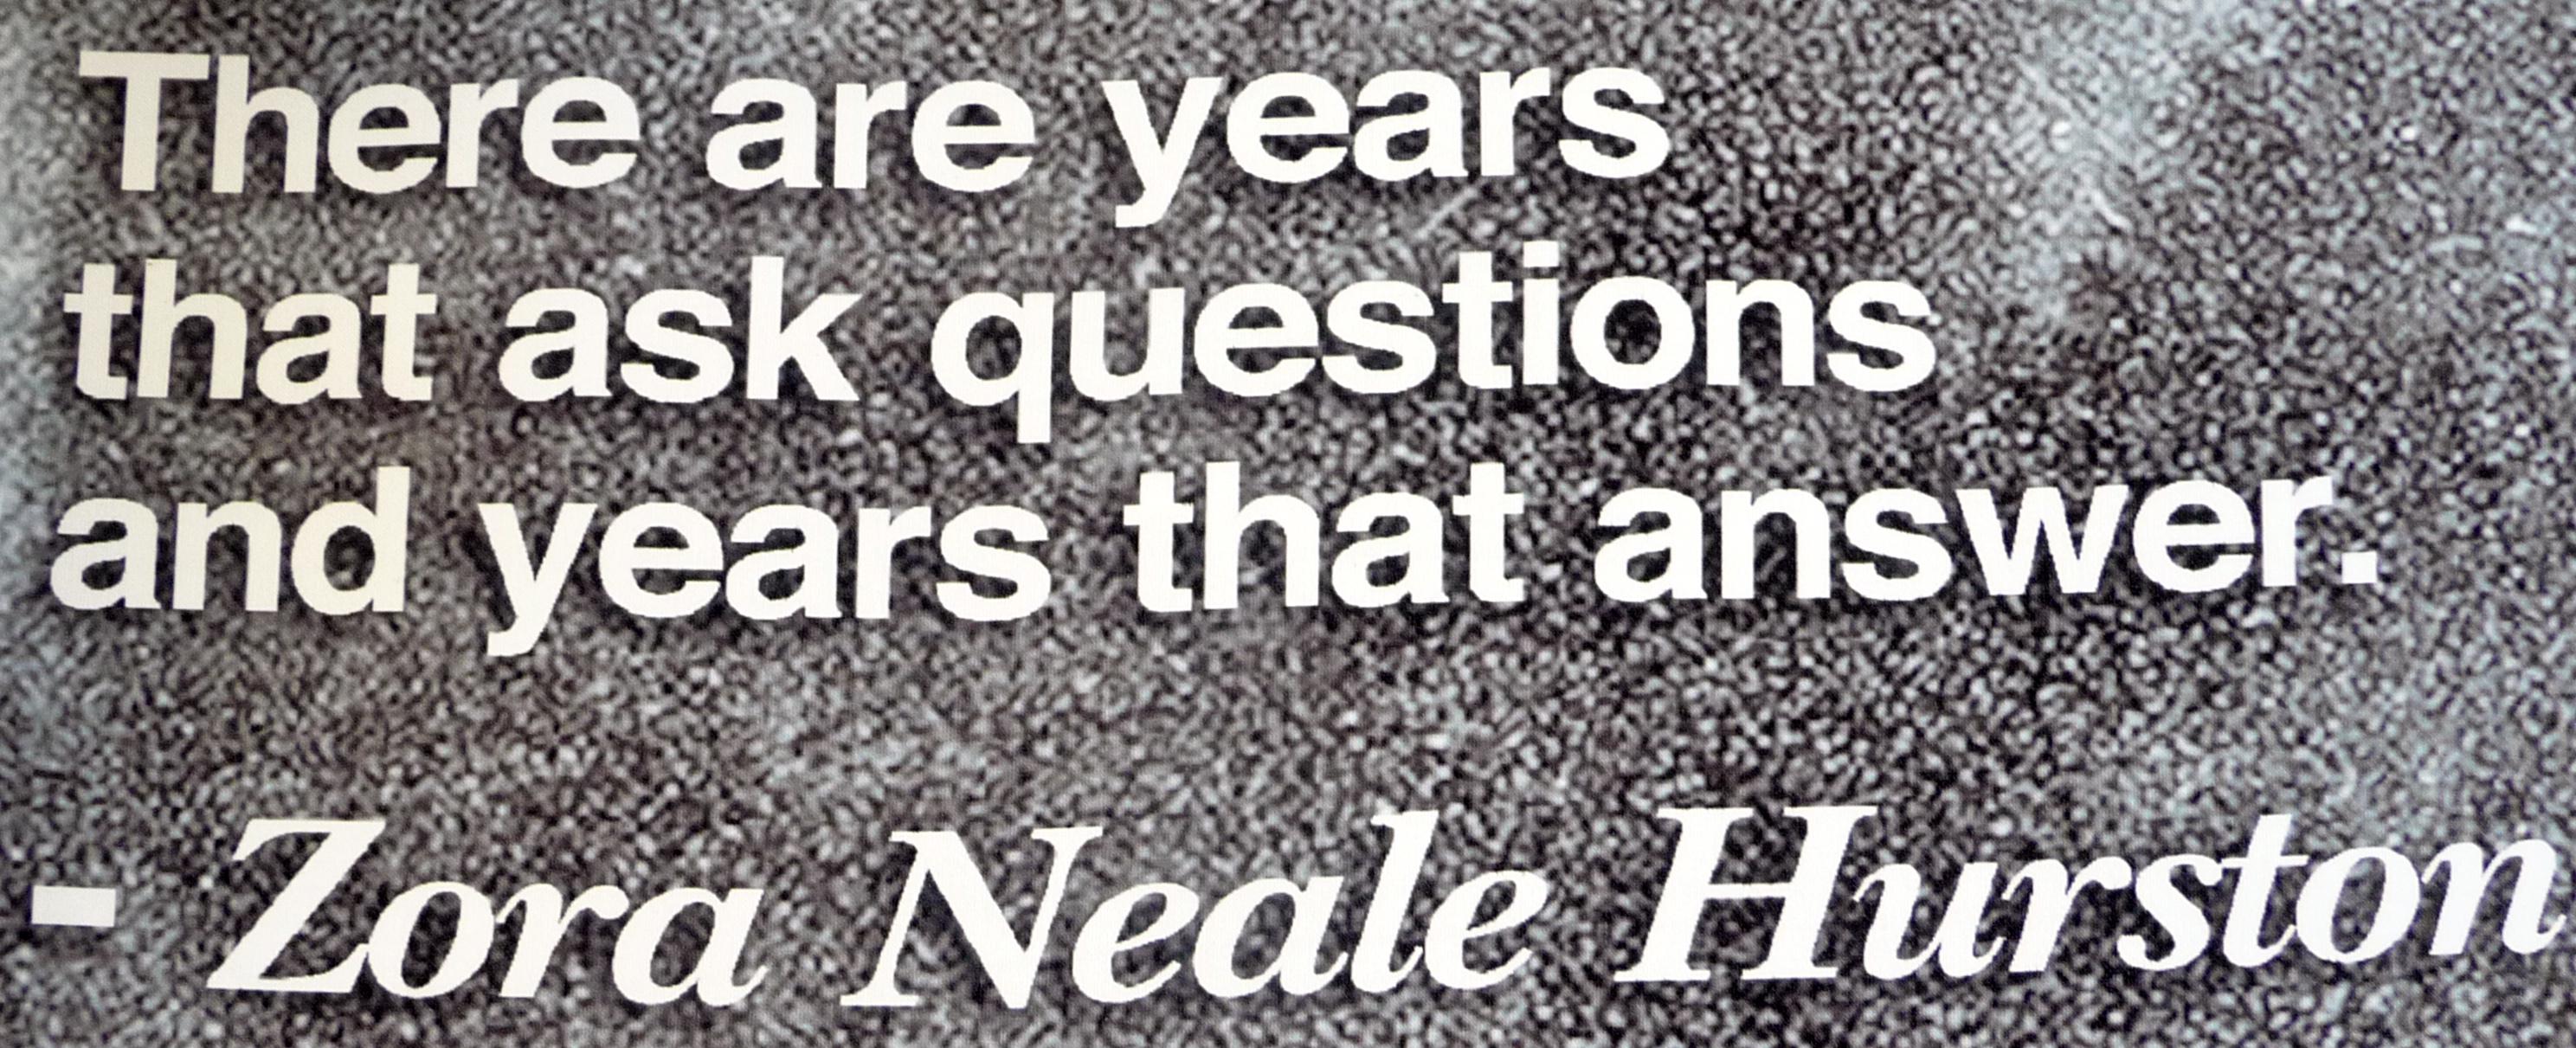 Zora Neale Hurston's quote #7